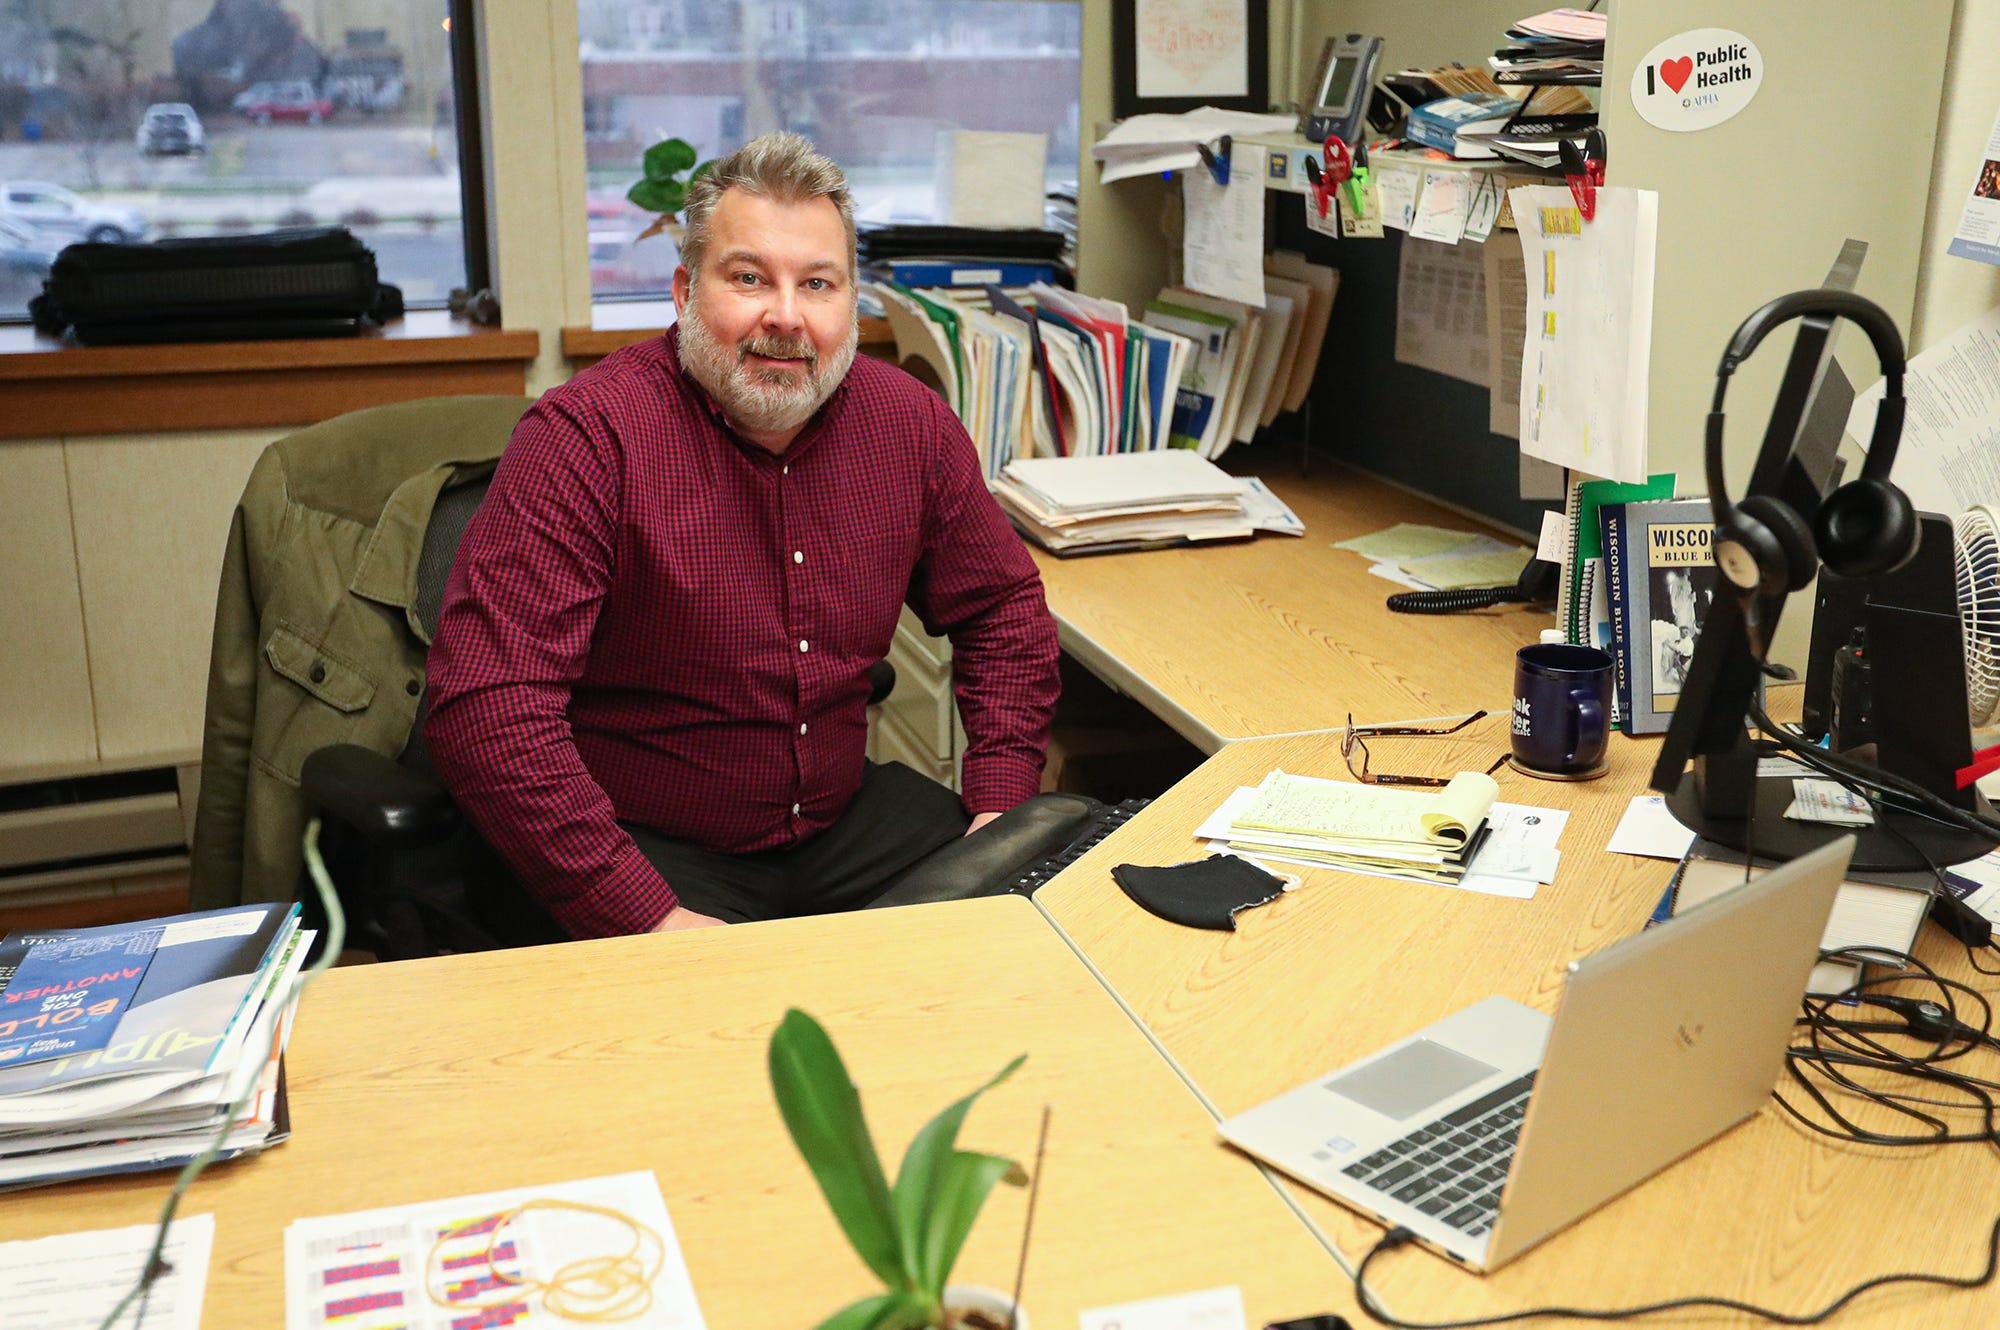 Winnebago County health officer Doug Gieryn works at his desk Wednesday, Nov. 25, 2020, at the Winnebago County Public Health building at 112 Otter St. in Oshkosh, Wis.